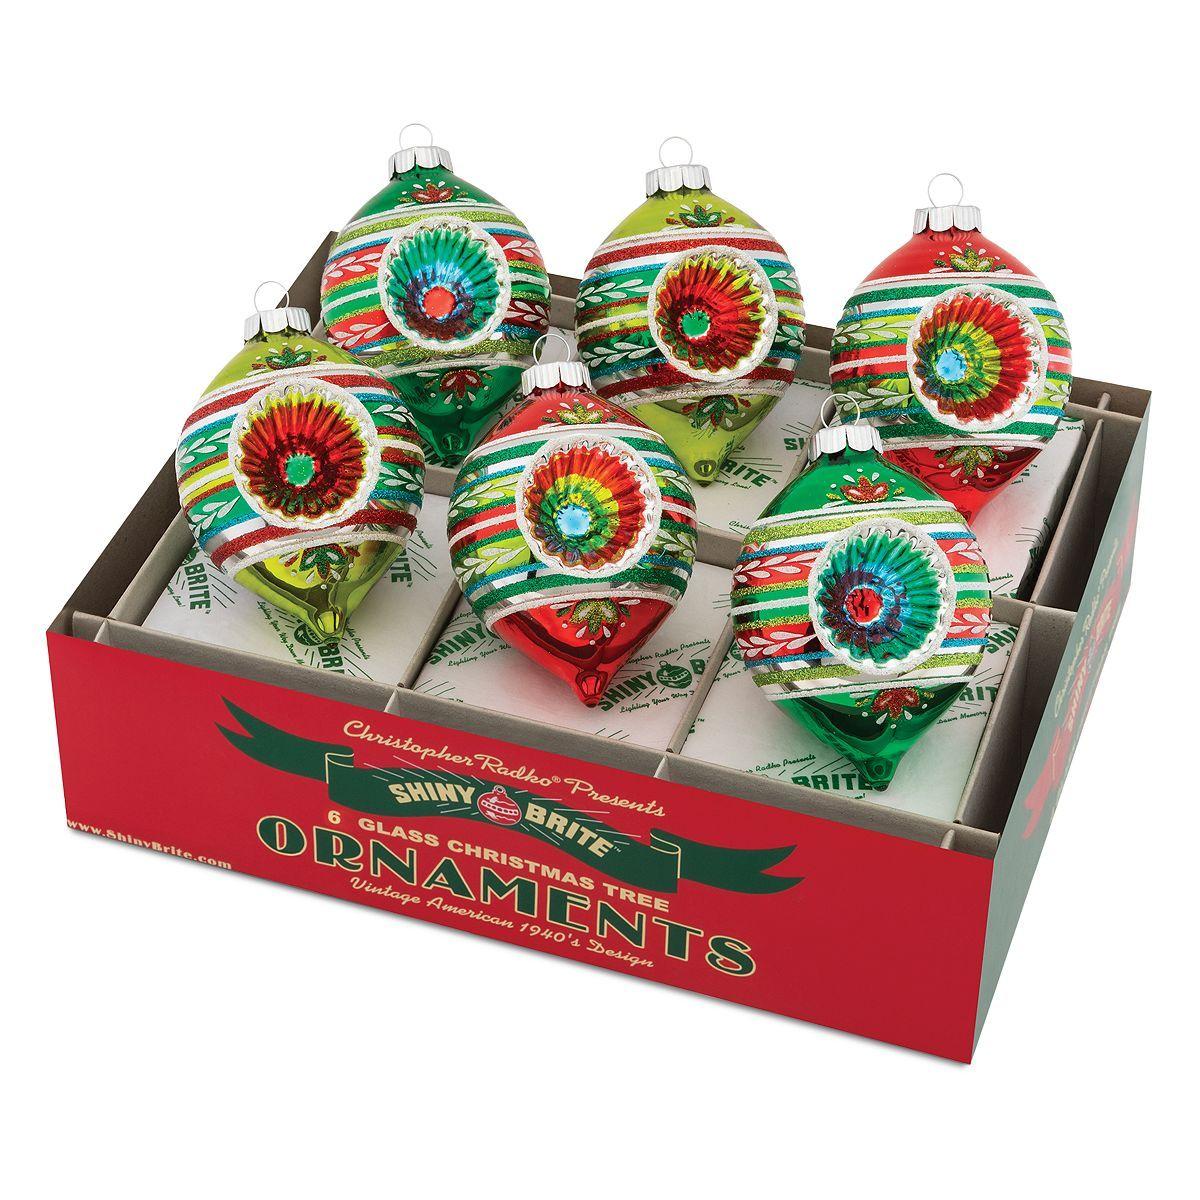 Radko Shiny Brite Holiday Splendor Shapes /& Rounds Vintage Style Ornaments Set12